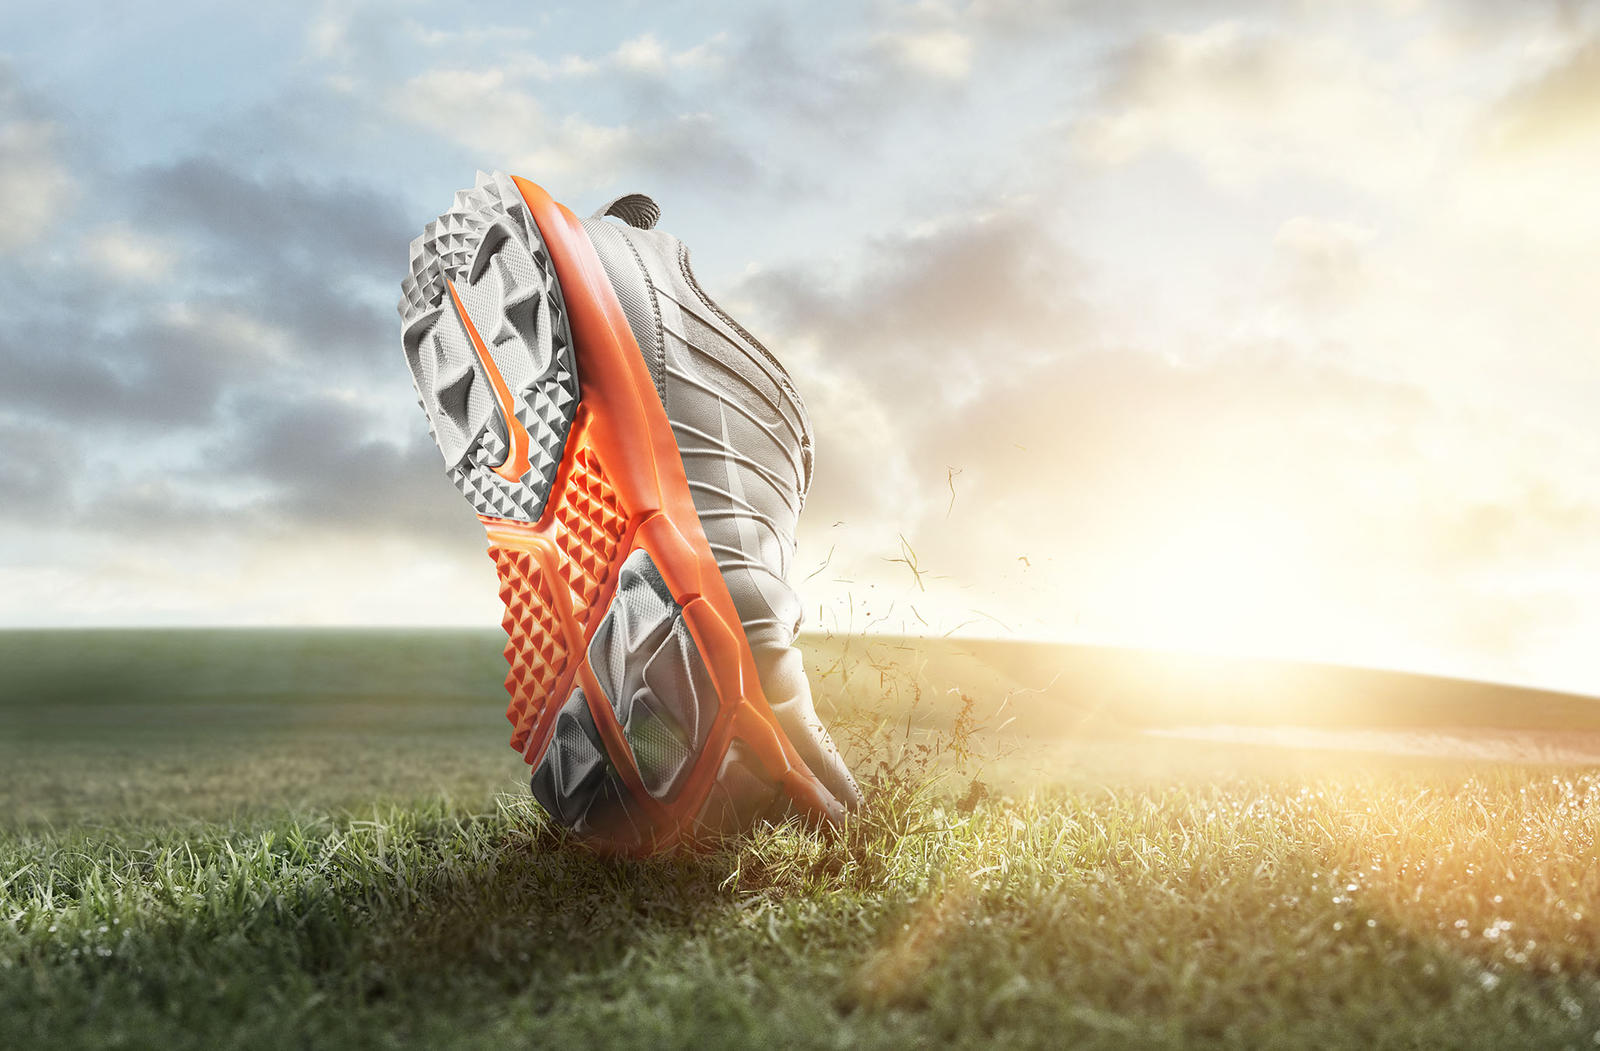 4da31fbbd445 Insights from Suzann Pettersen Inform the Nike FI Impact 2 - Nike News